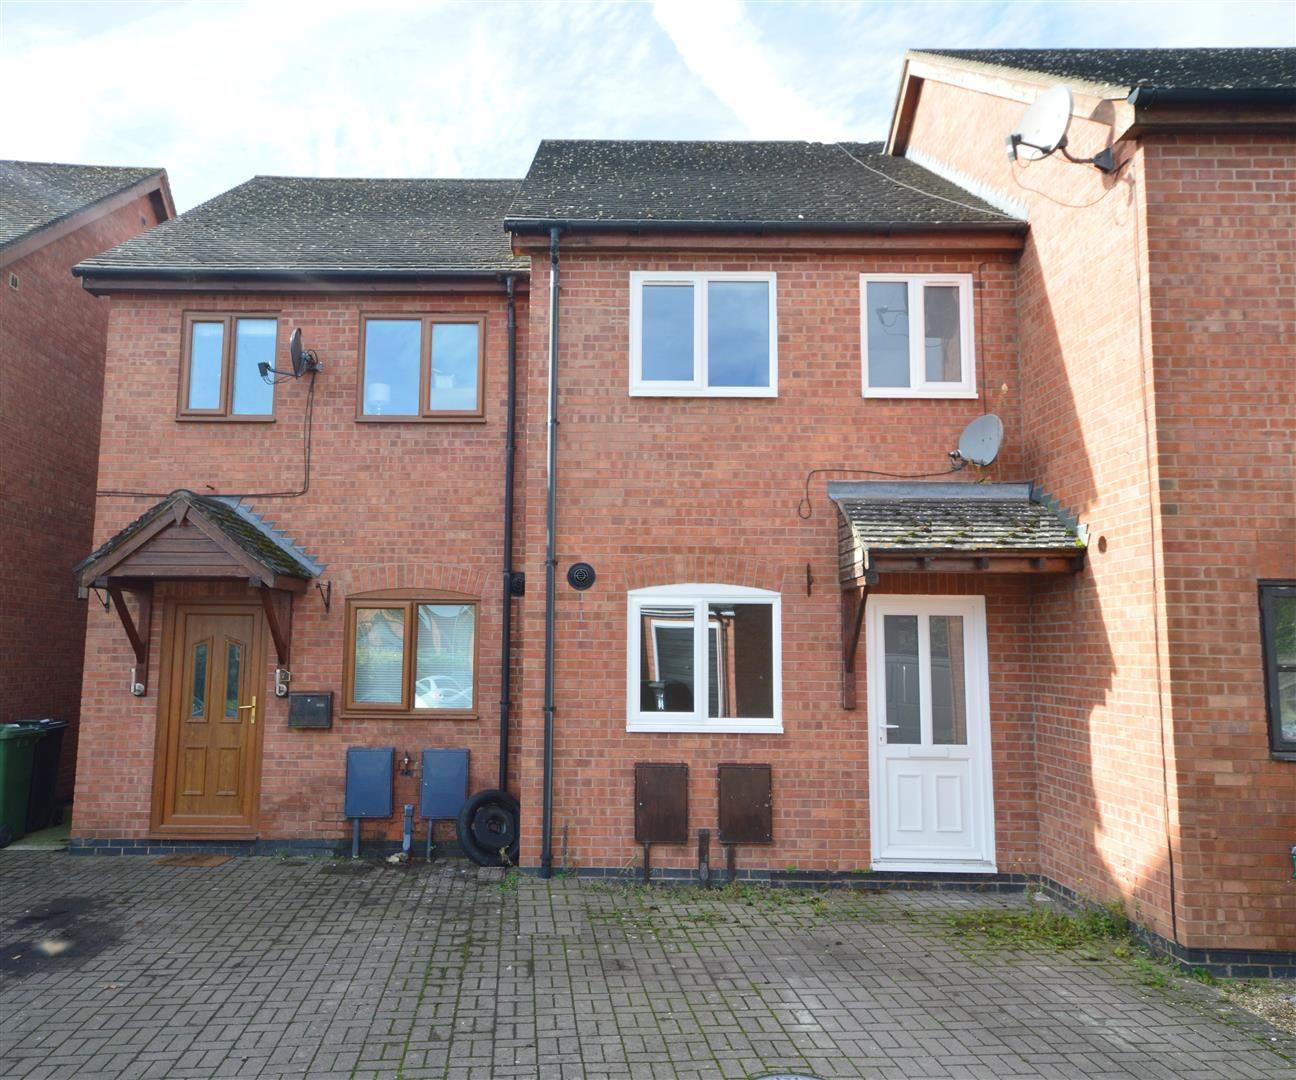 2 bed terraced for sale in Lower Bullingham 2